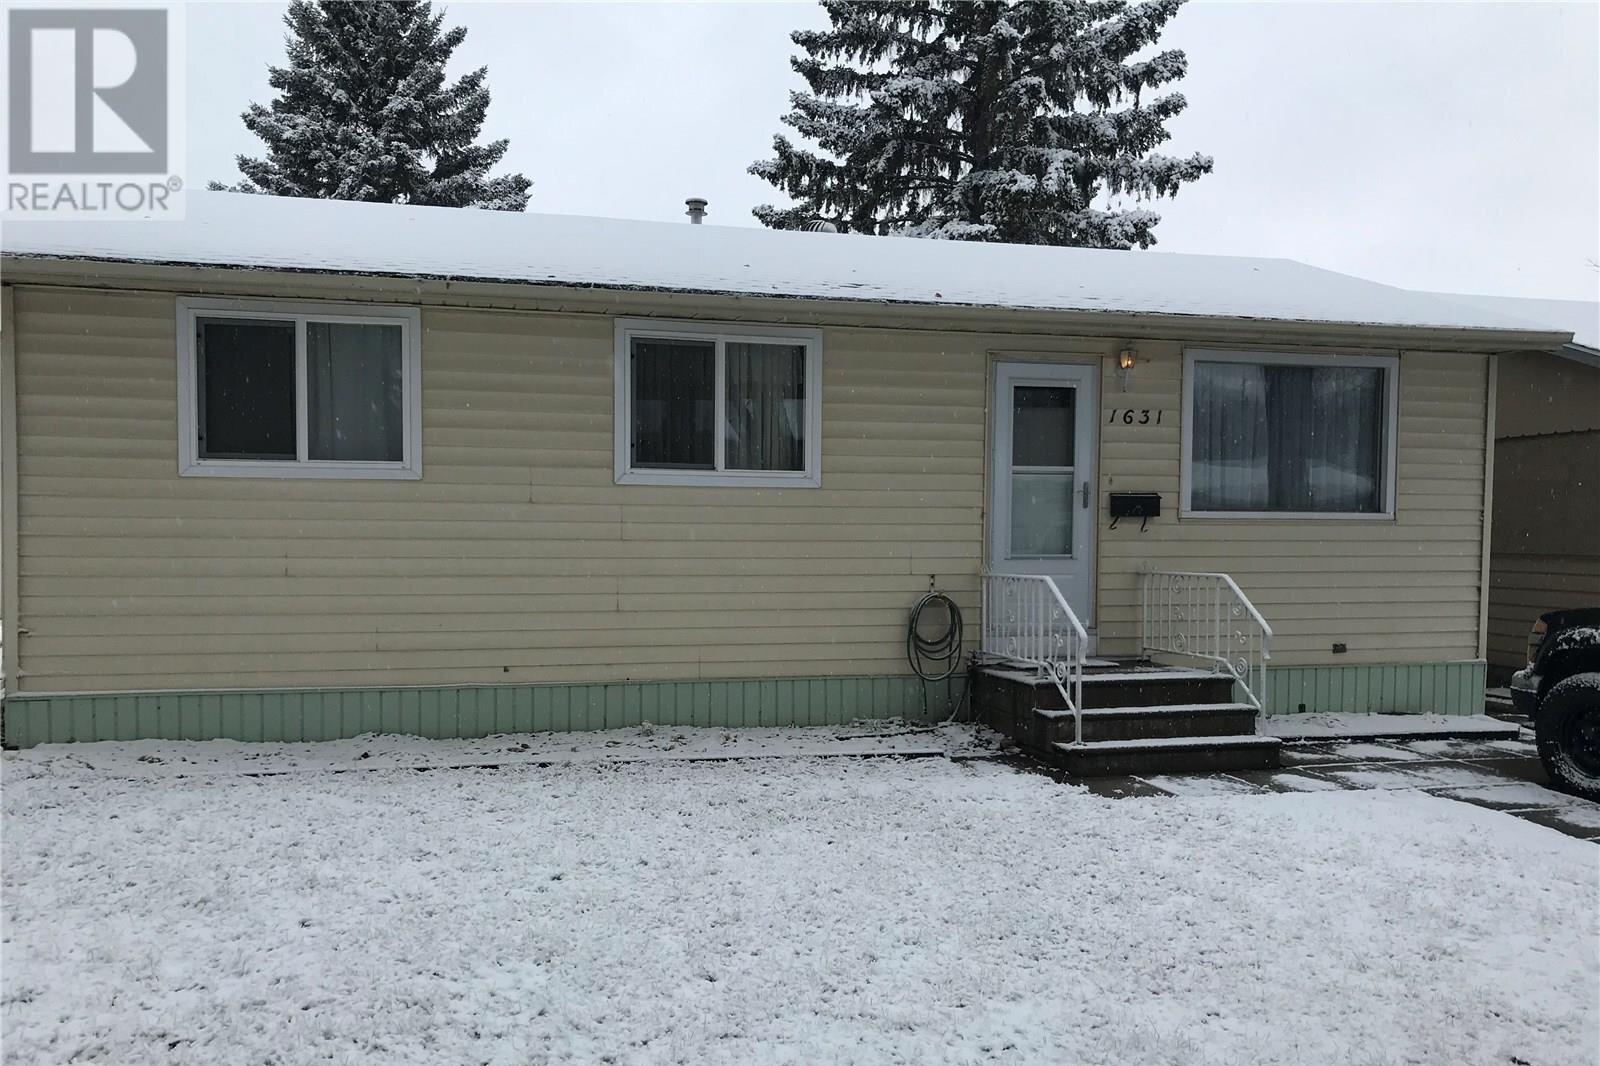 House for sale at 1631 G Ave N Saskatoon Saskatchewan - MLS: SK821289